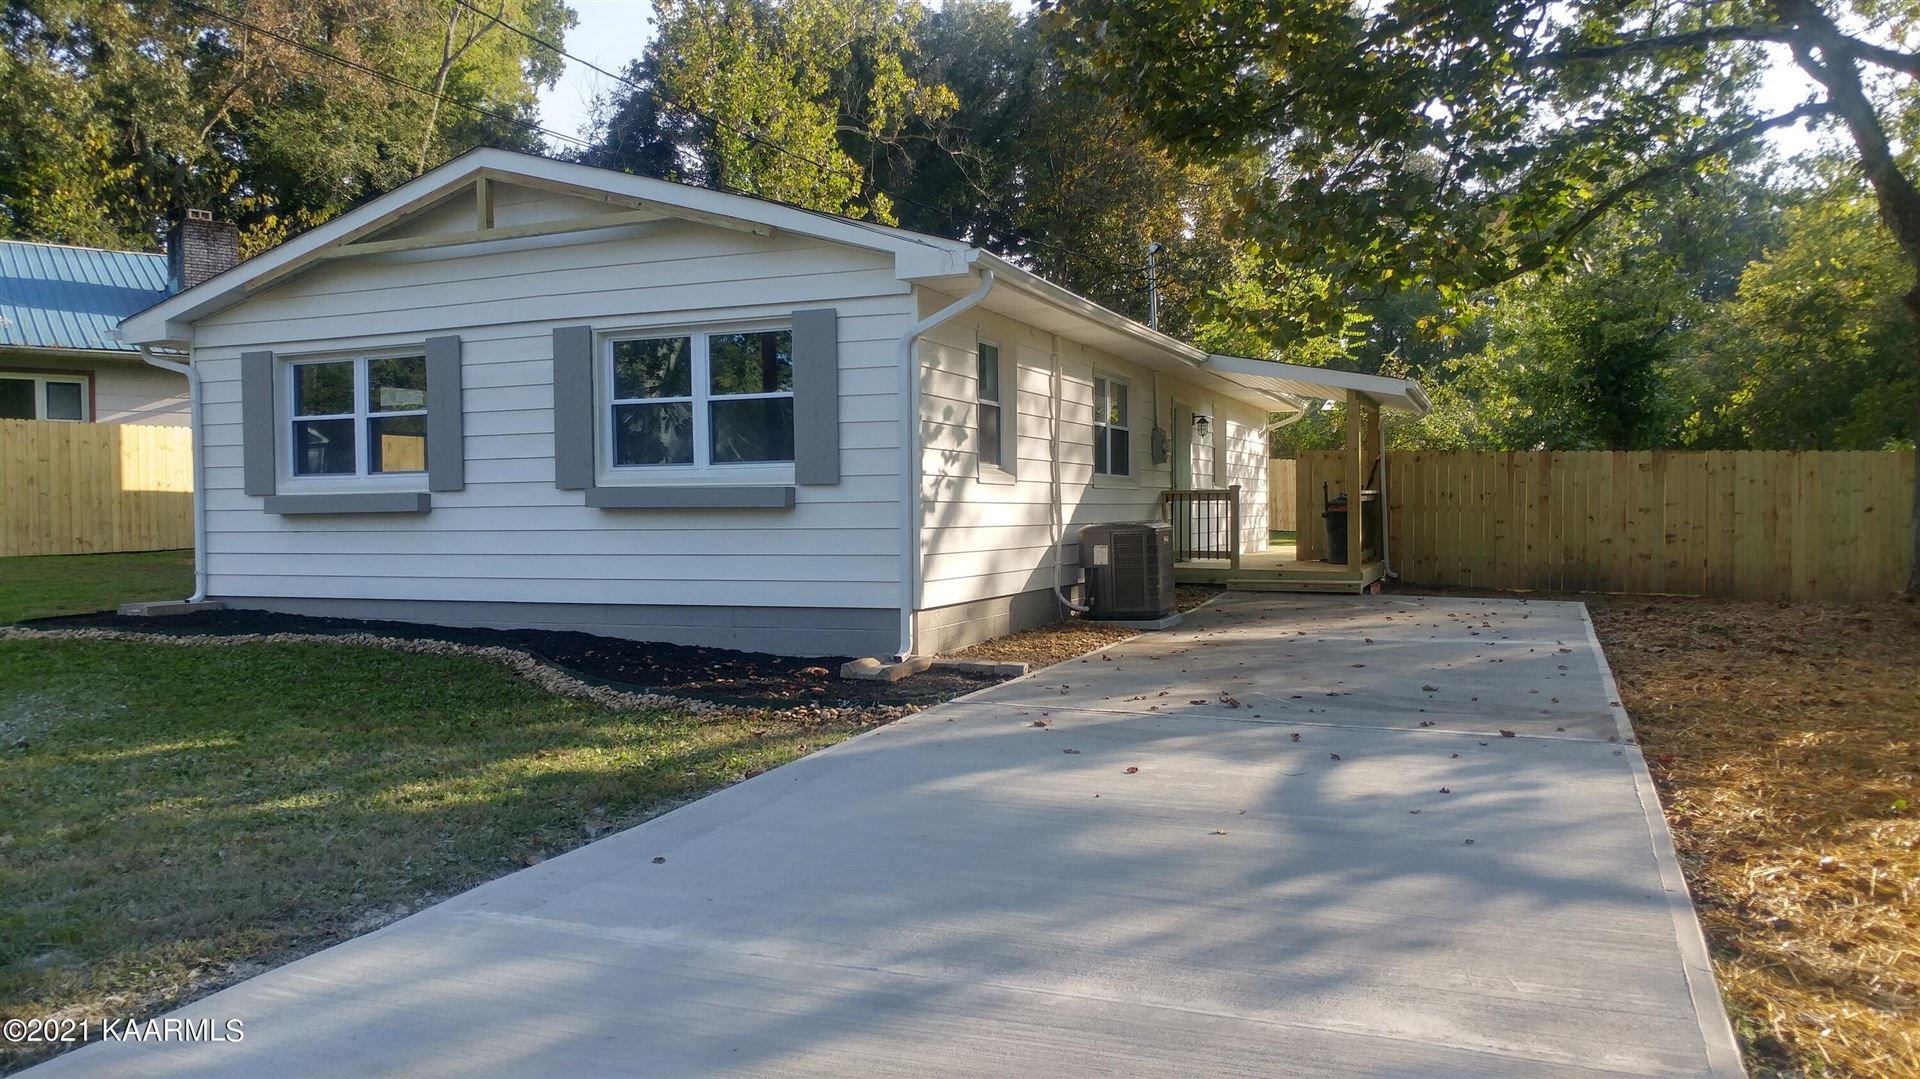 Photo of 100 Morris Lane, Oak Ridge, TN 37830 (MLS # 1170772)